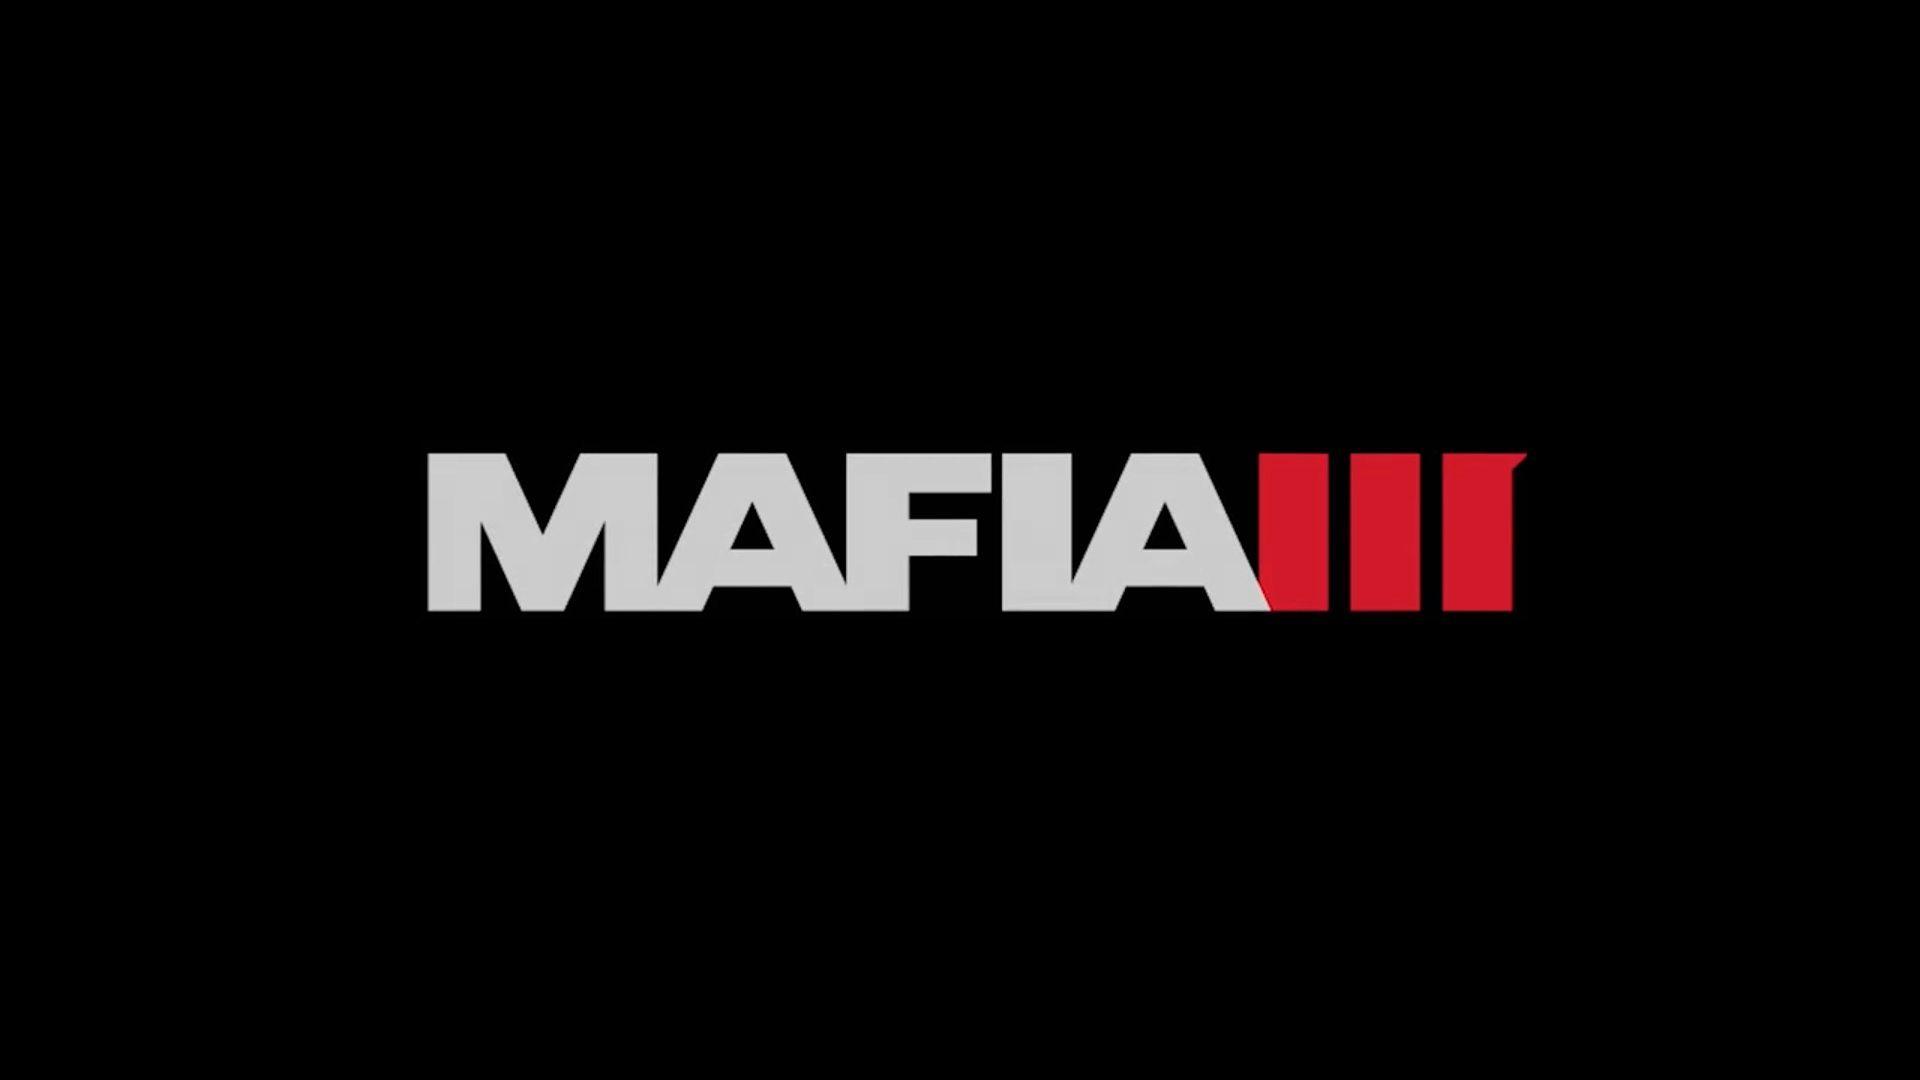 Mafia 3 Wallpapers For Iphone Sdeerwallpaper Gamers